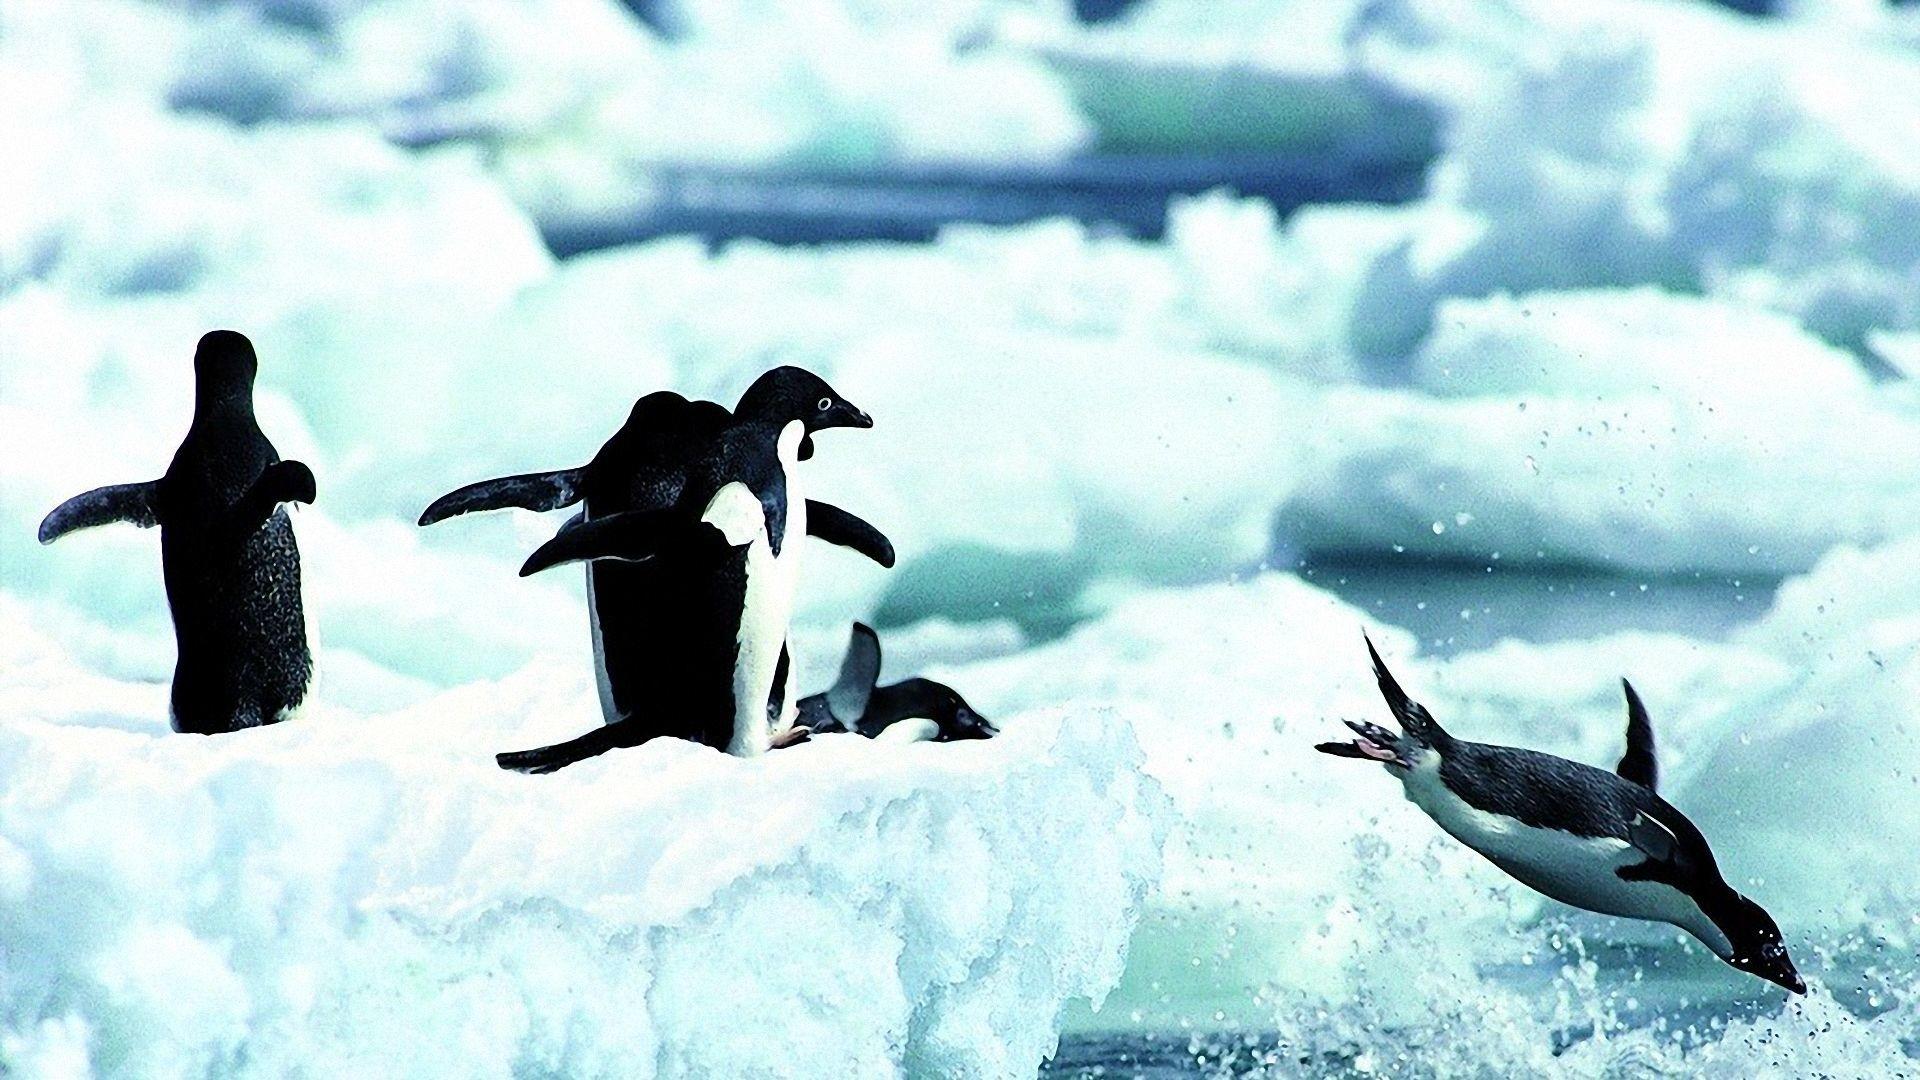 Penguin Wallpaper Wallpapers,Penguin Wallpapers .